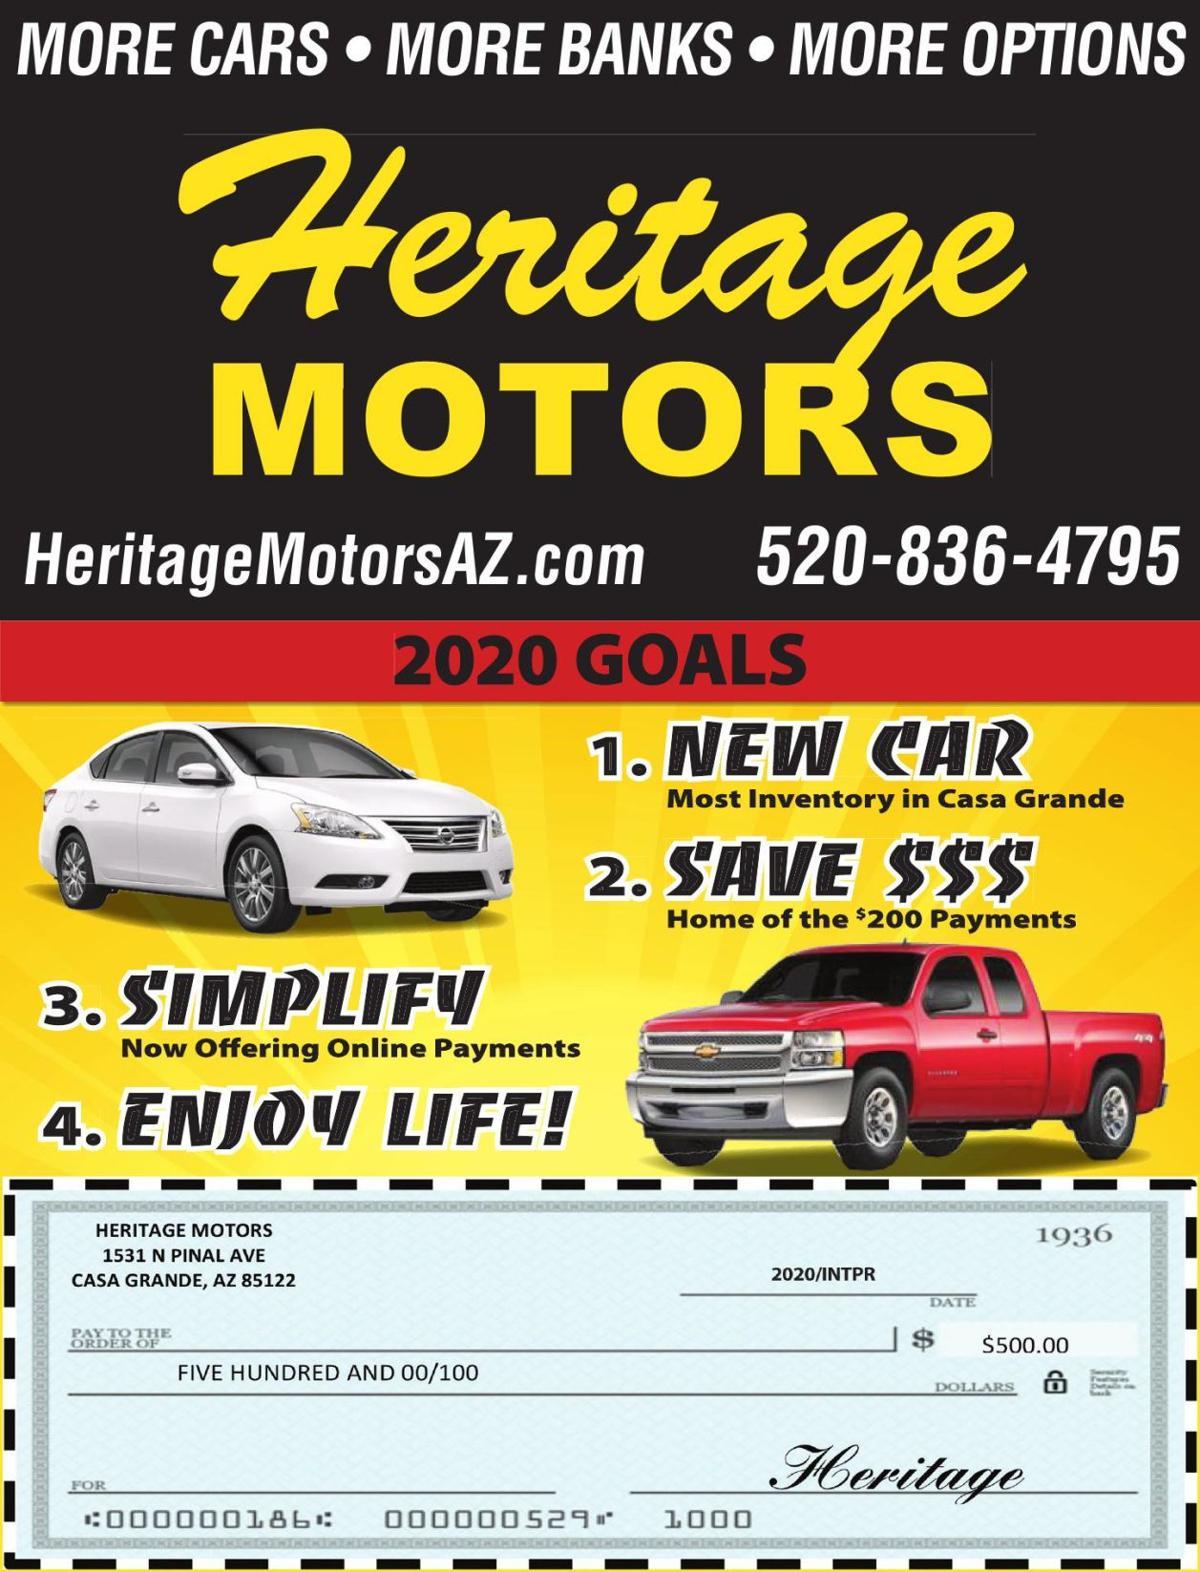 Heritage Motors